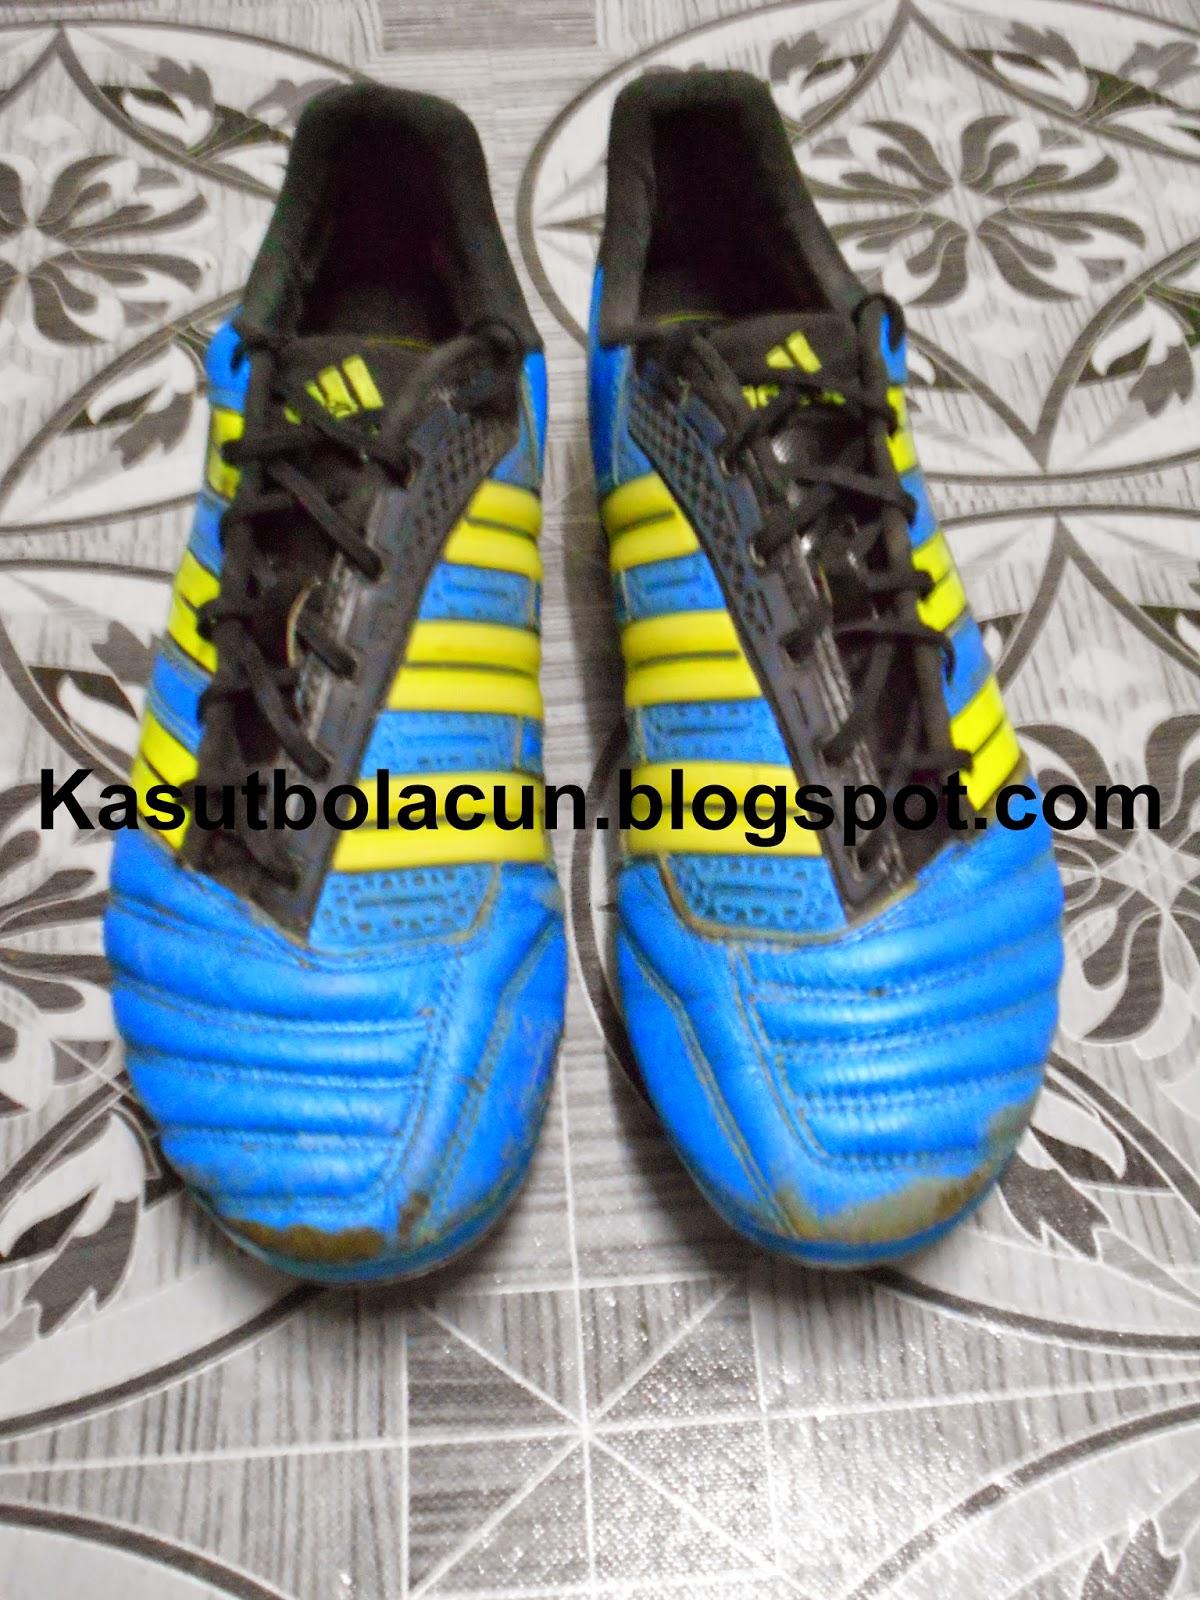 http://kasutbolacun.blogspot.com/2014/12/adidas-adipower-predator-sg.html